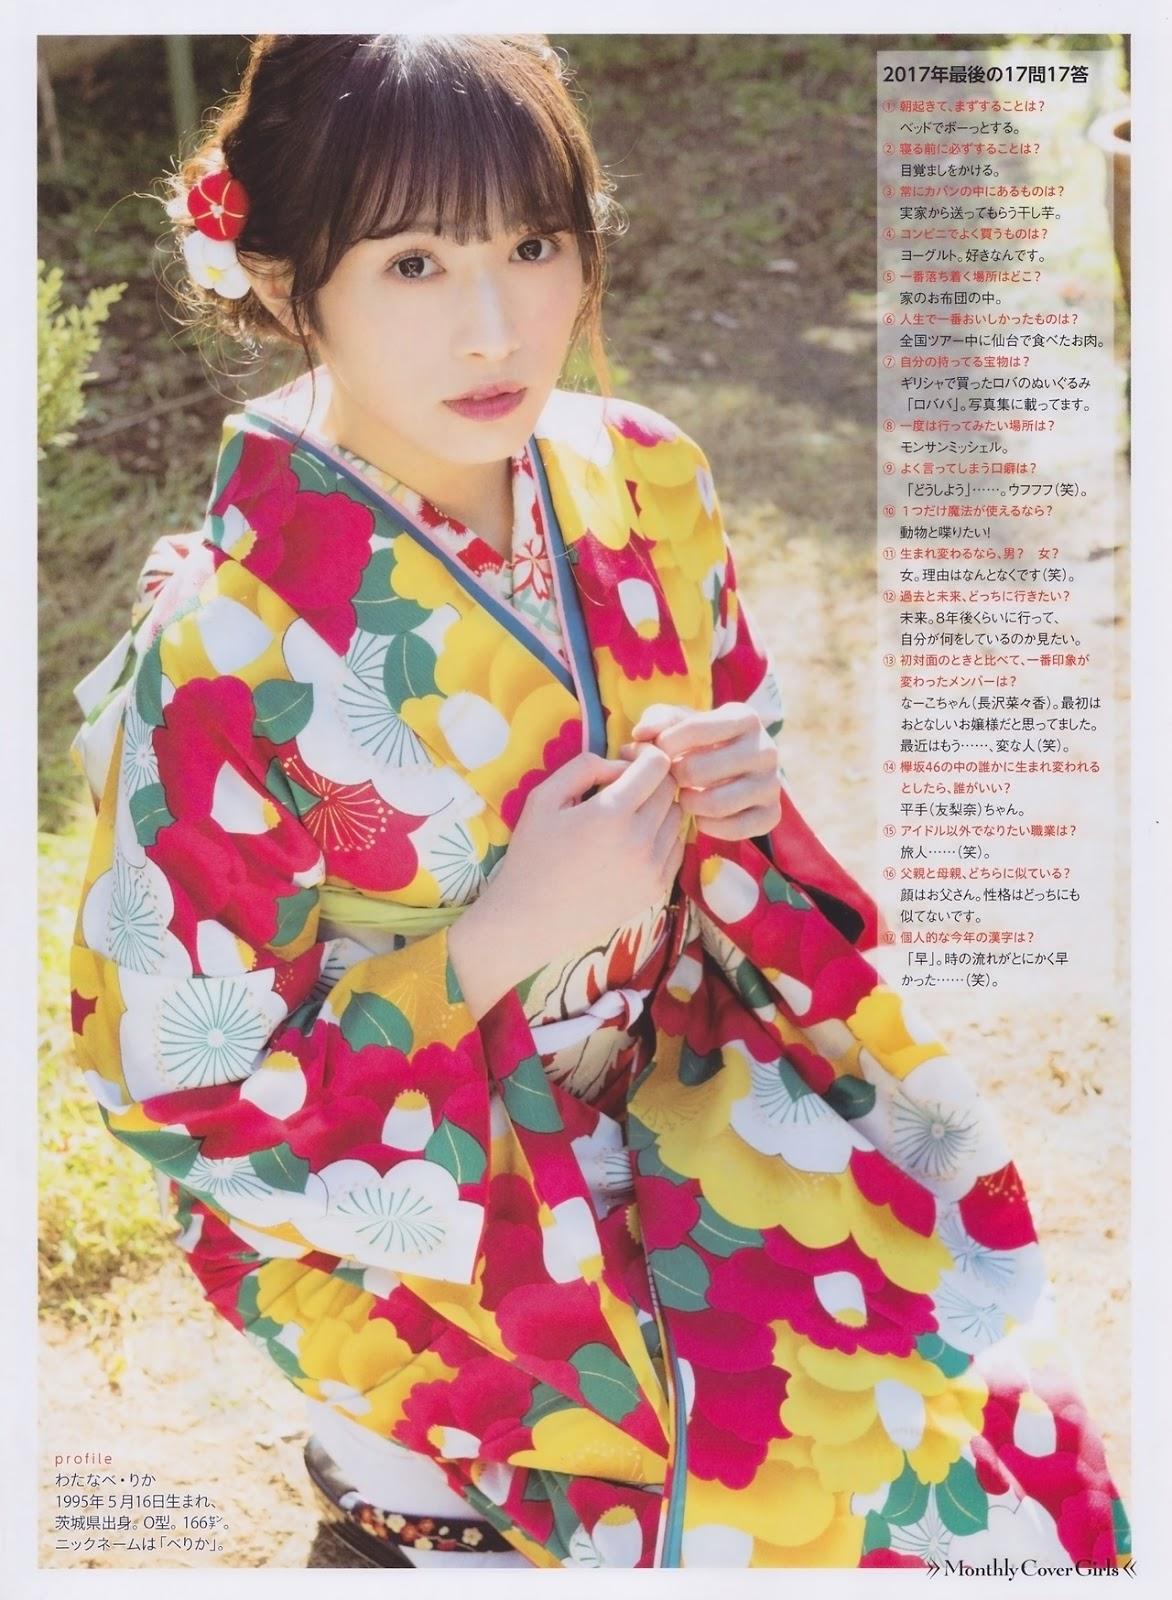 Watanabe Rika 渡辺梨加, Watanabe Risa 渡邉理佐, Gekkan ENTAME 2018.01 (月刊エンタメ 2018年01号)